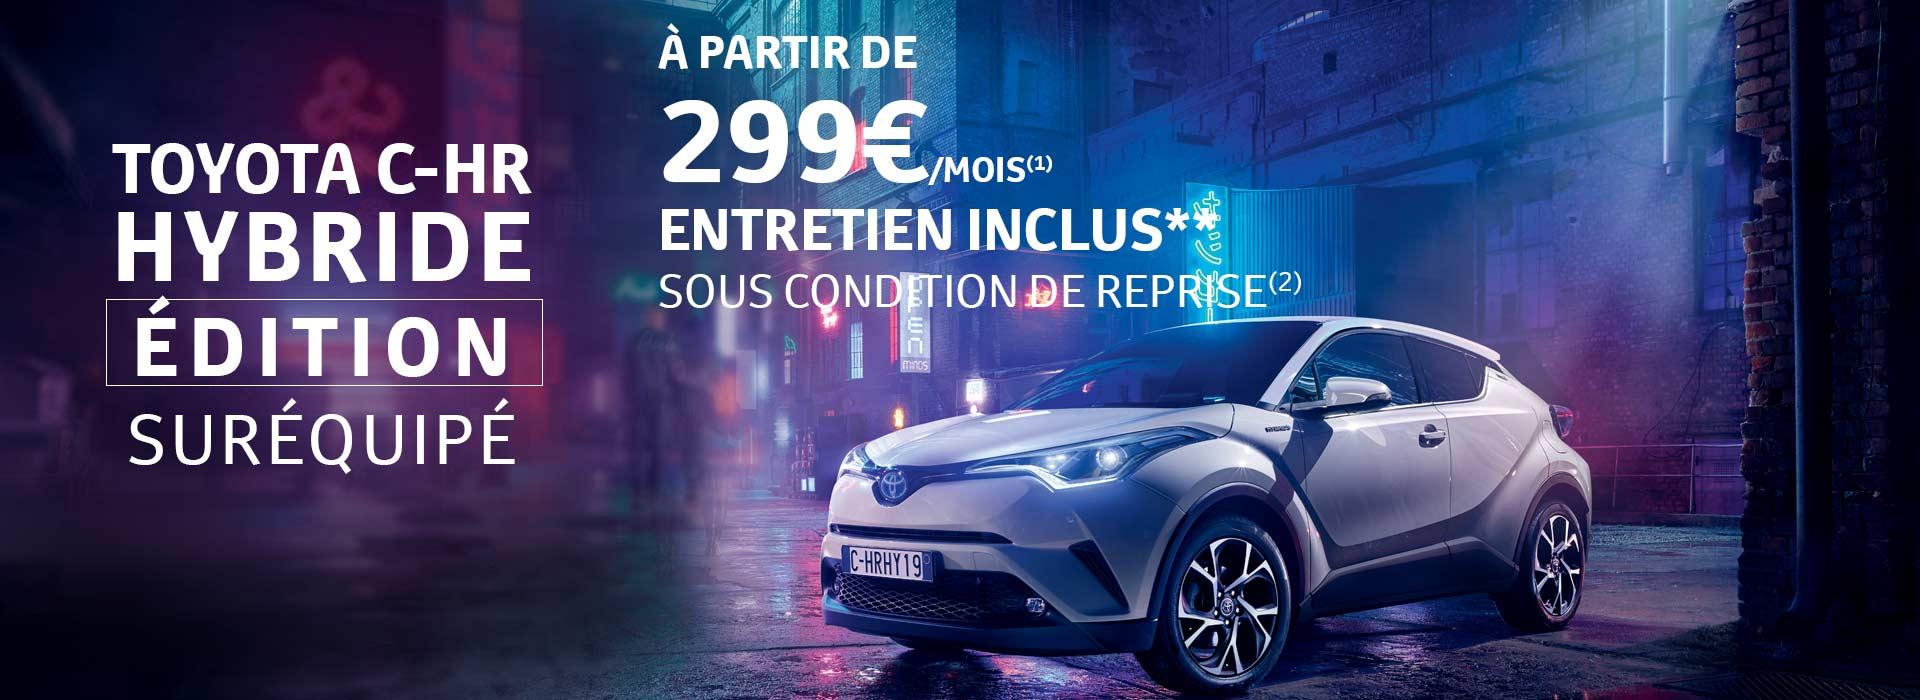 Toyota C HR Dition Surquipe